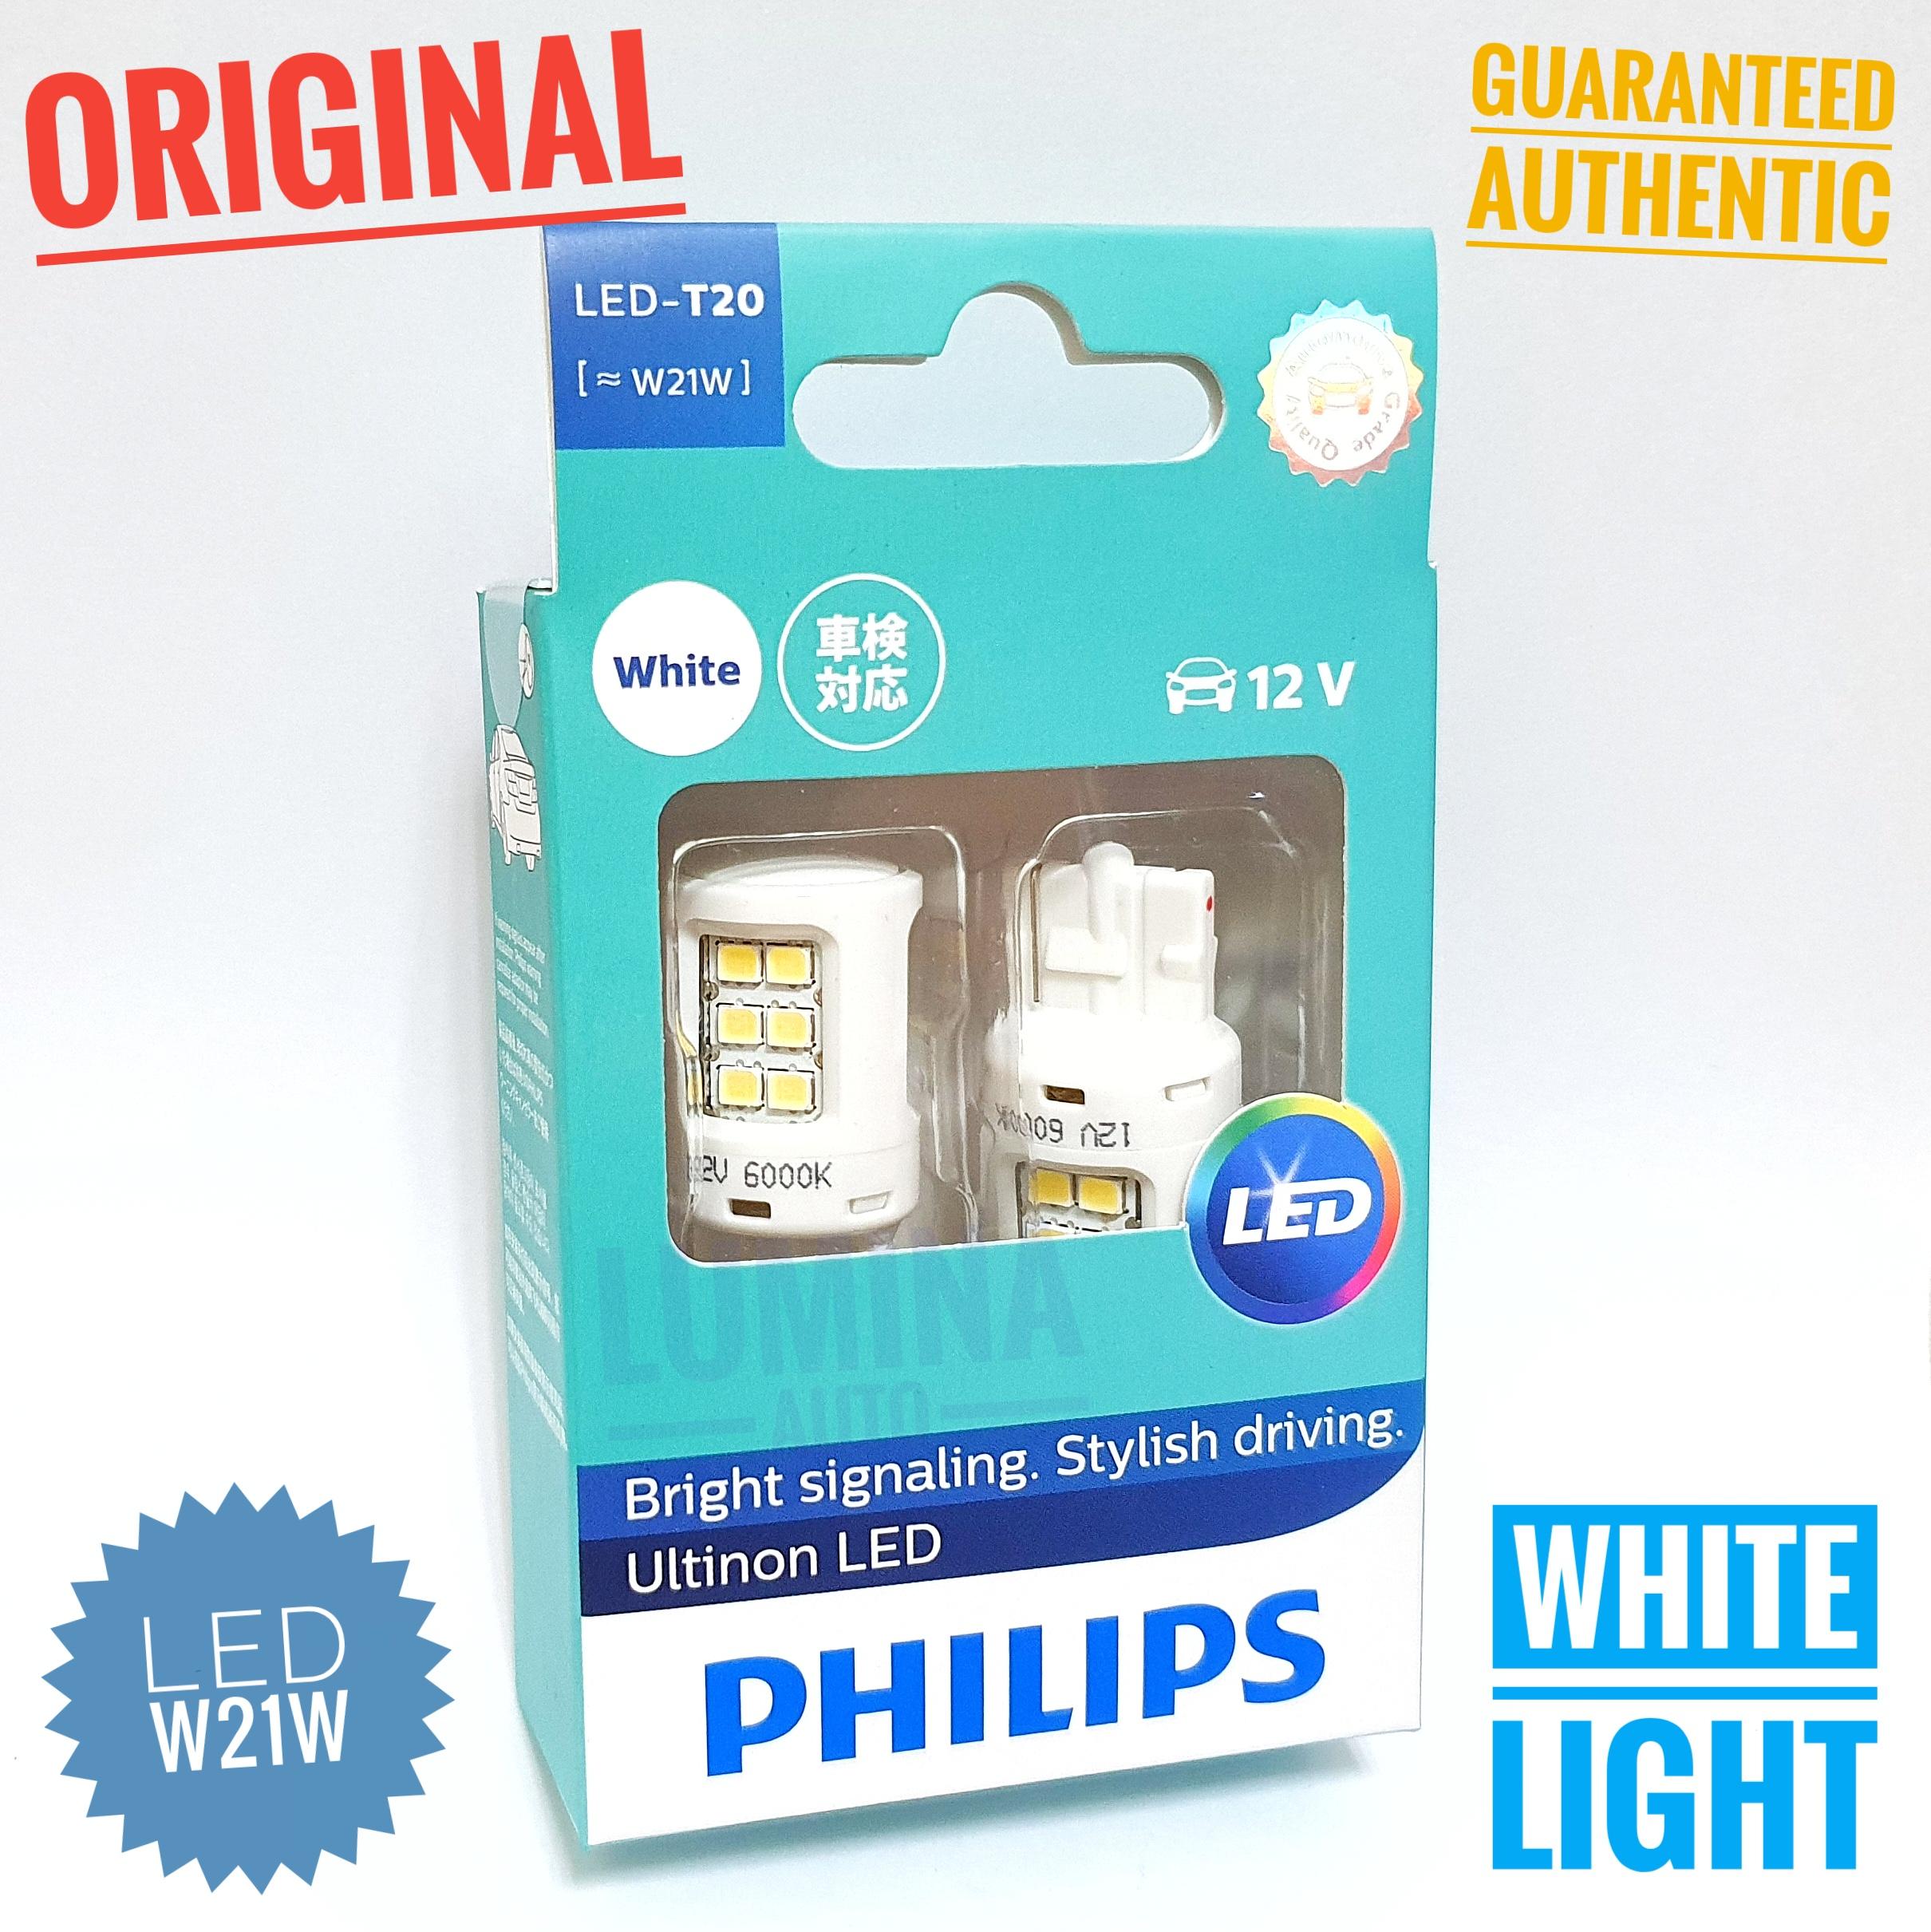 Philips LED T20 W21W Putih White - Lampu Senja Innova Reborn